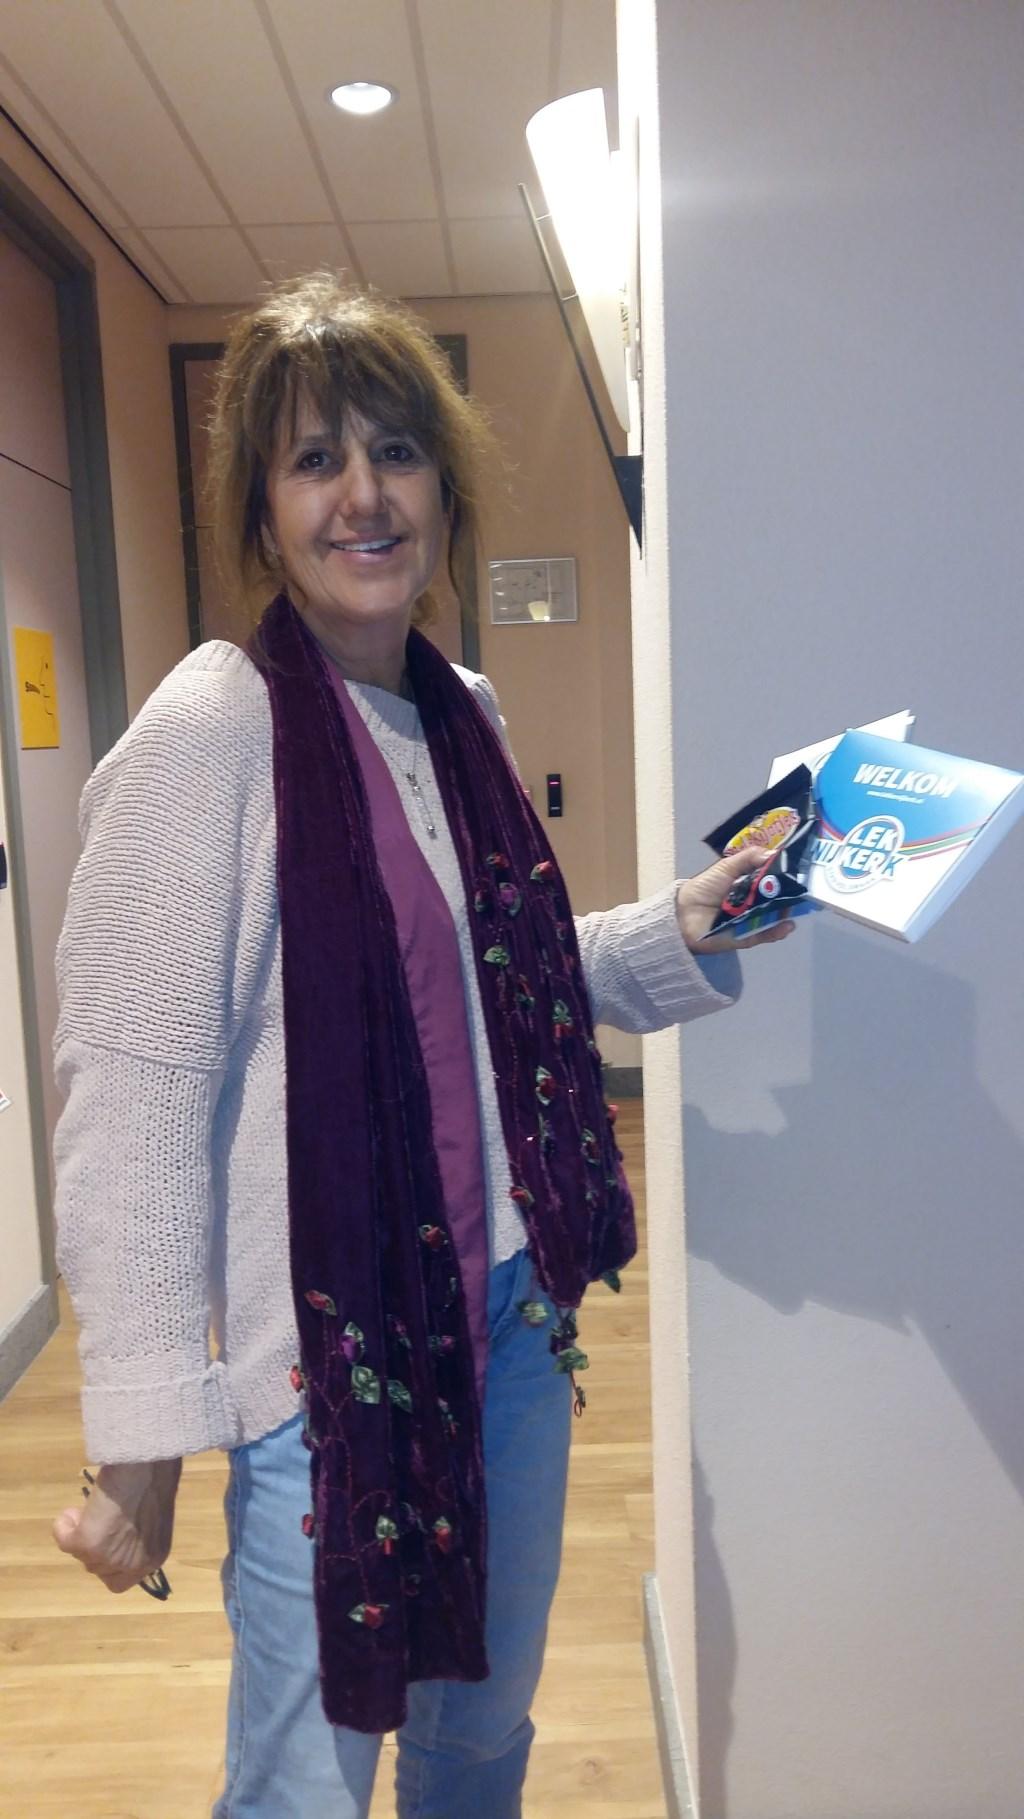 Jeanette Blonk ontving ook het pakketje. Gemeente Nijkerk © BDU Media